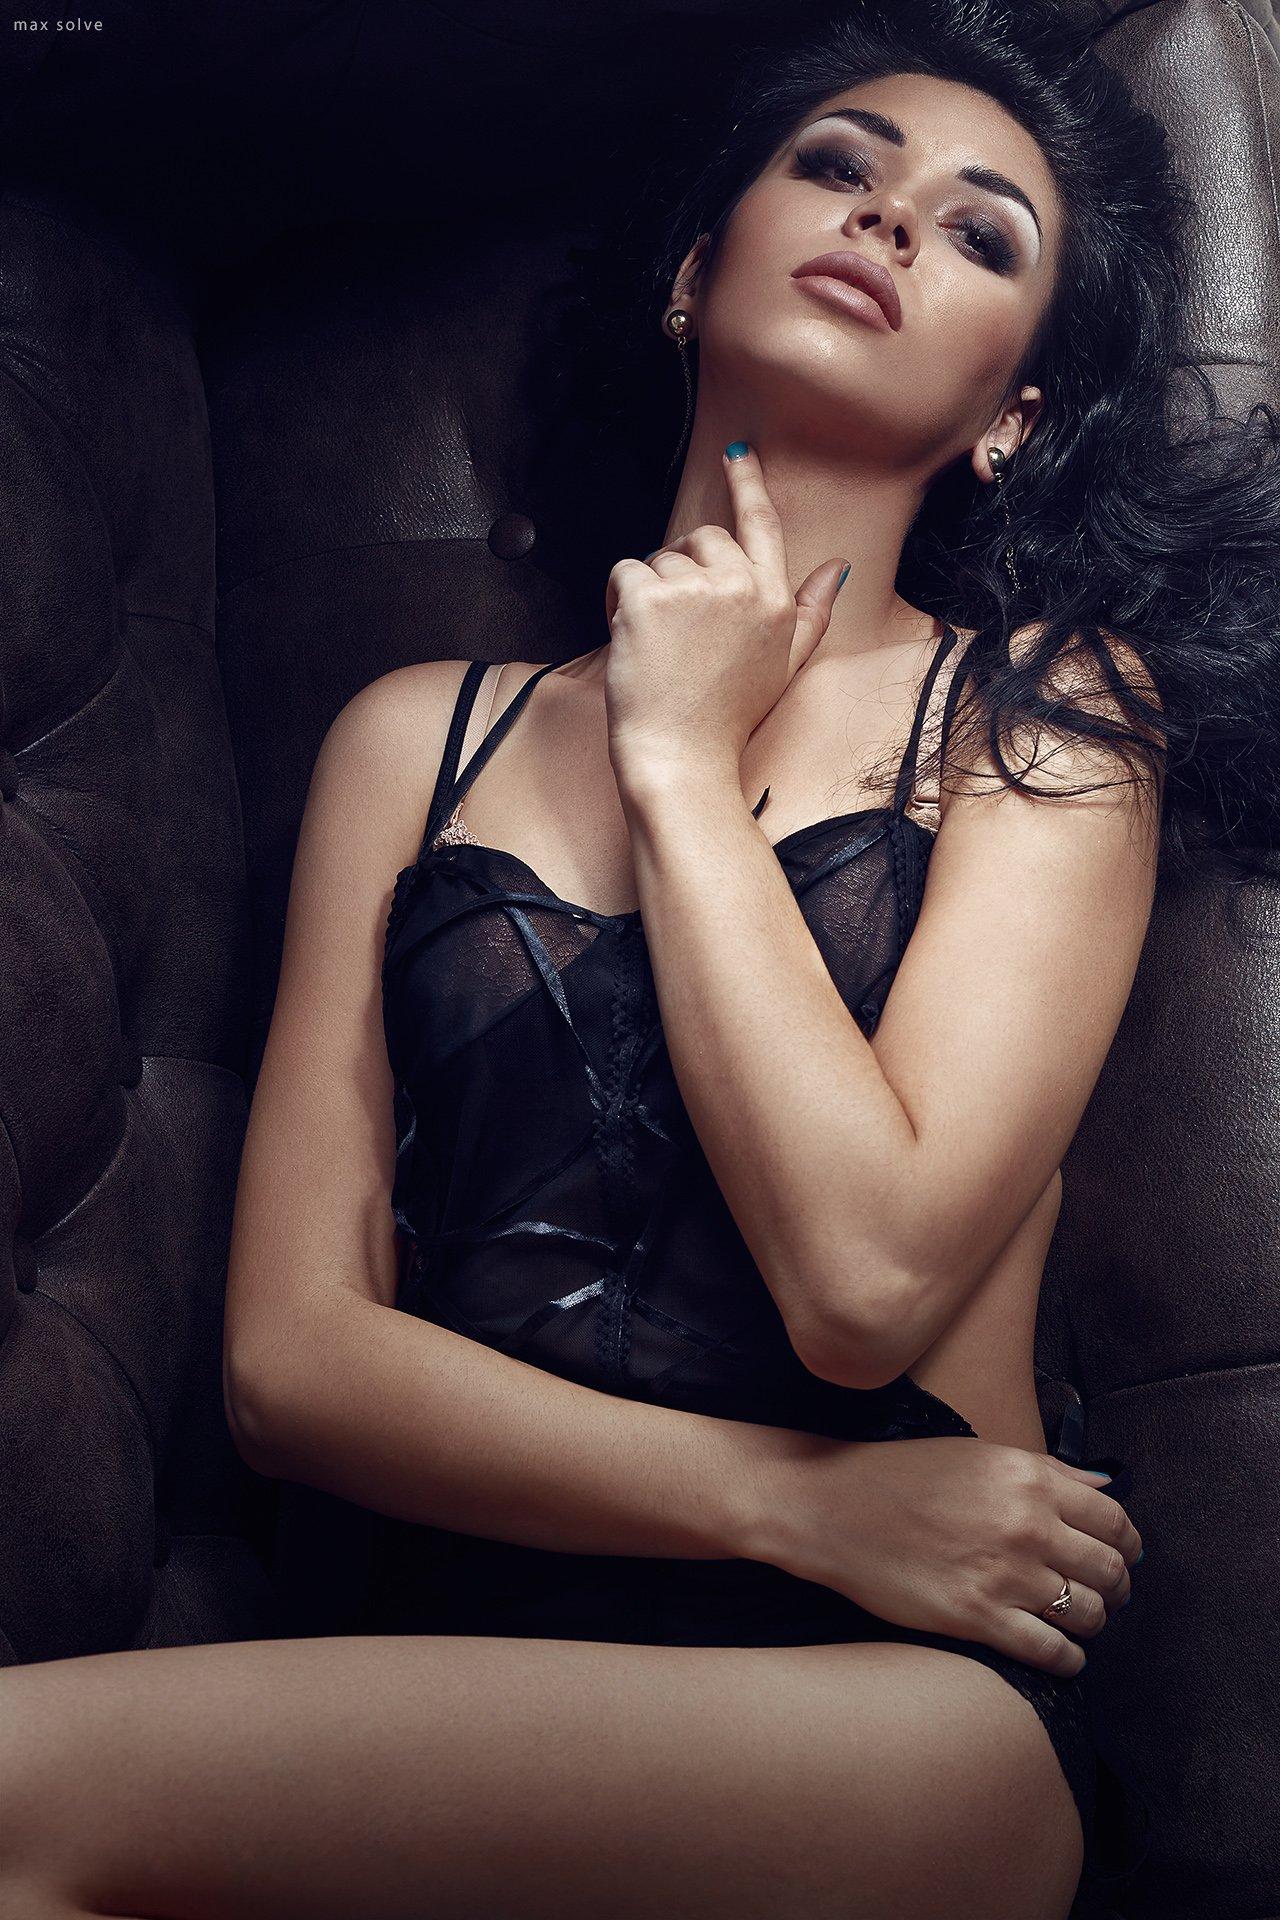 sexy, girl, girls, model, models, fashion, beauty, studio, mua, makeup, make-up, make up,, Max Solve